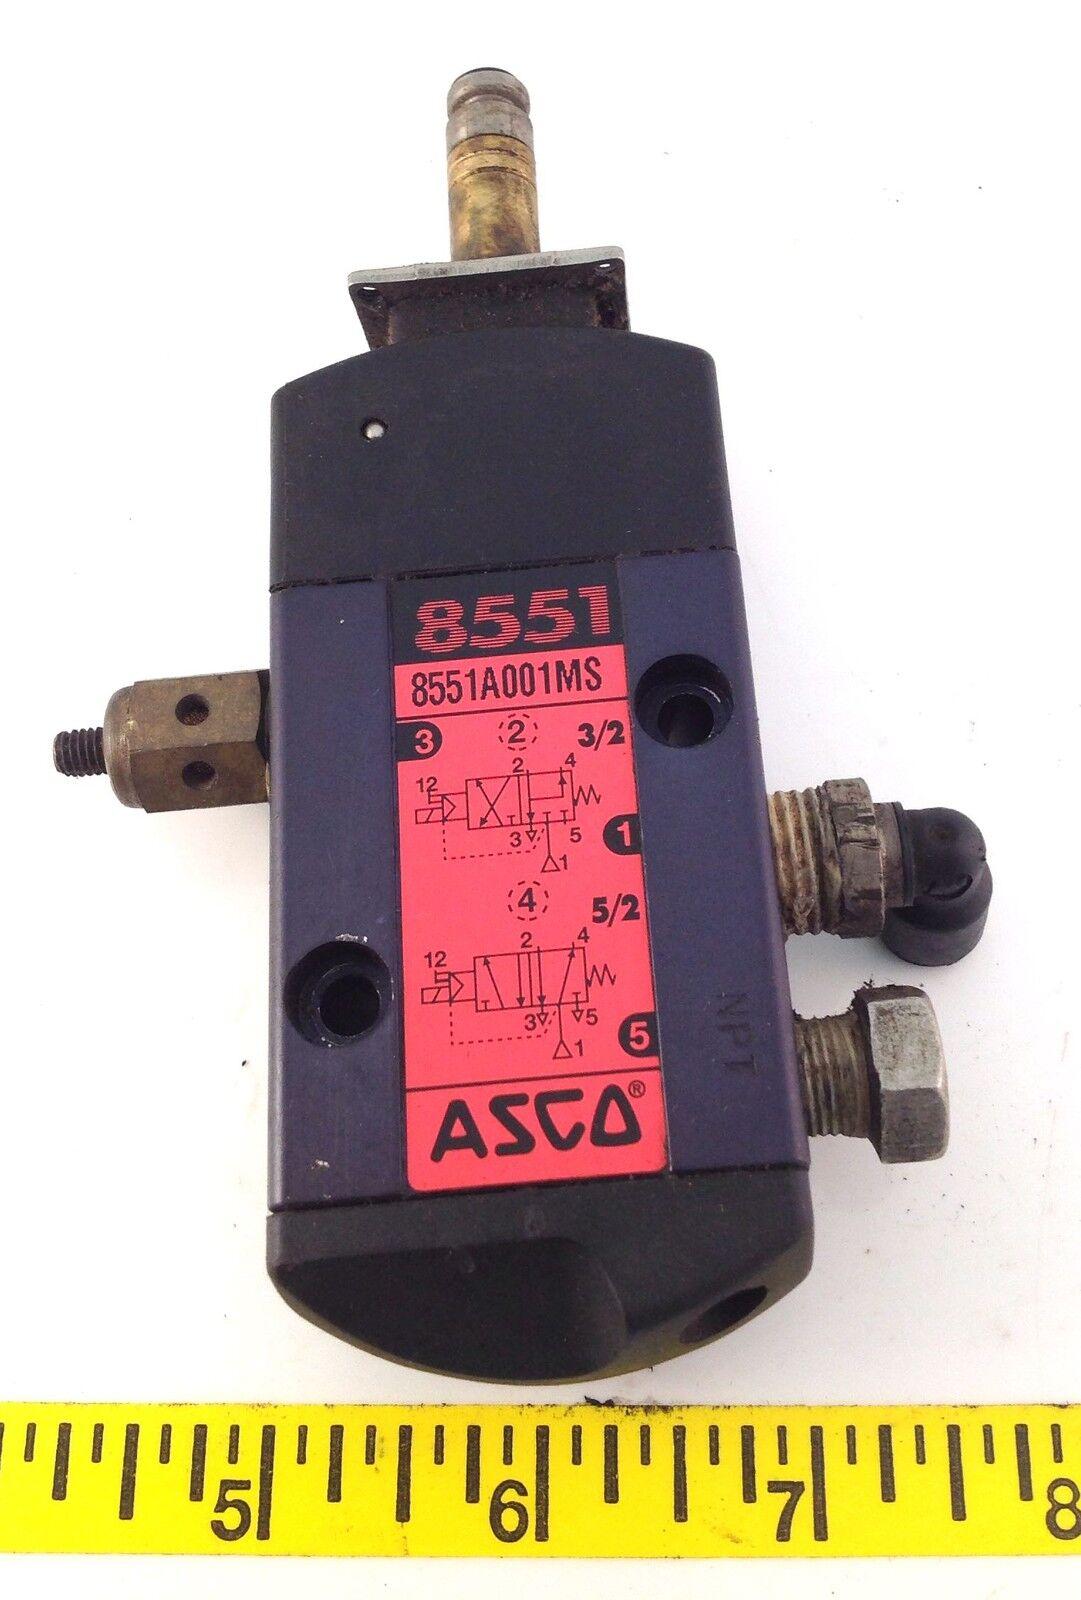 s l1600 asco 8551 solenoid wiring diagram asco wiring diagrams asco 920 contactor wiring diagram at eliteediting.co